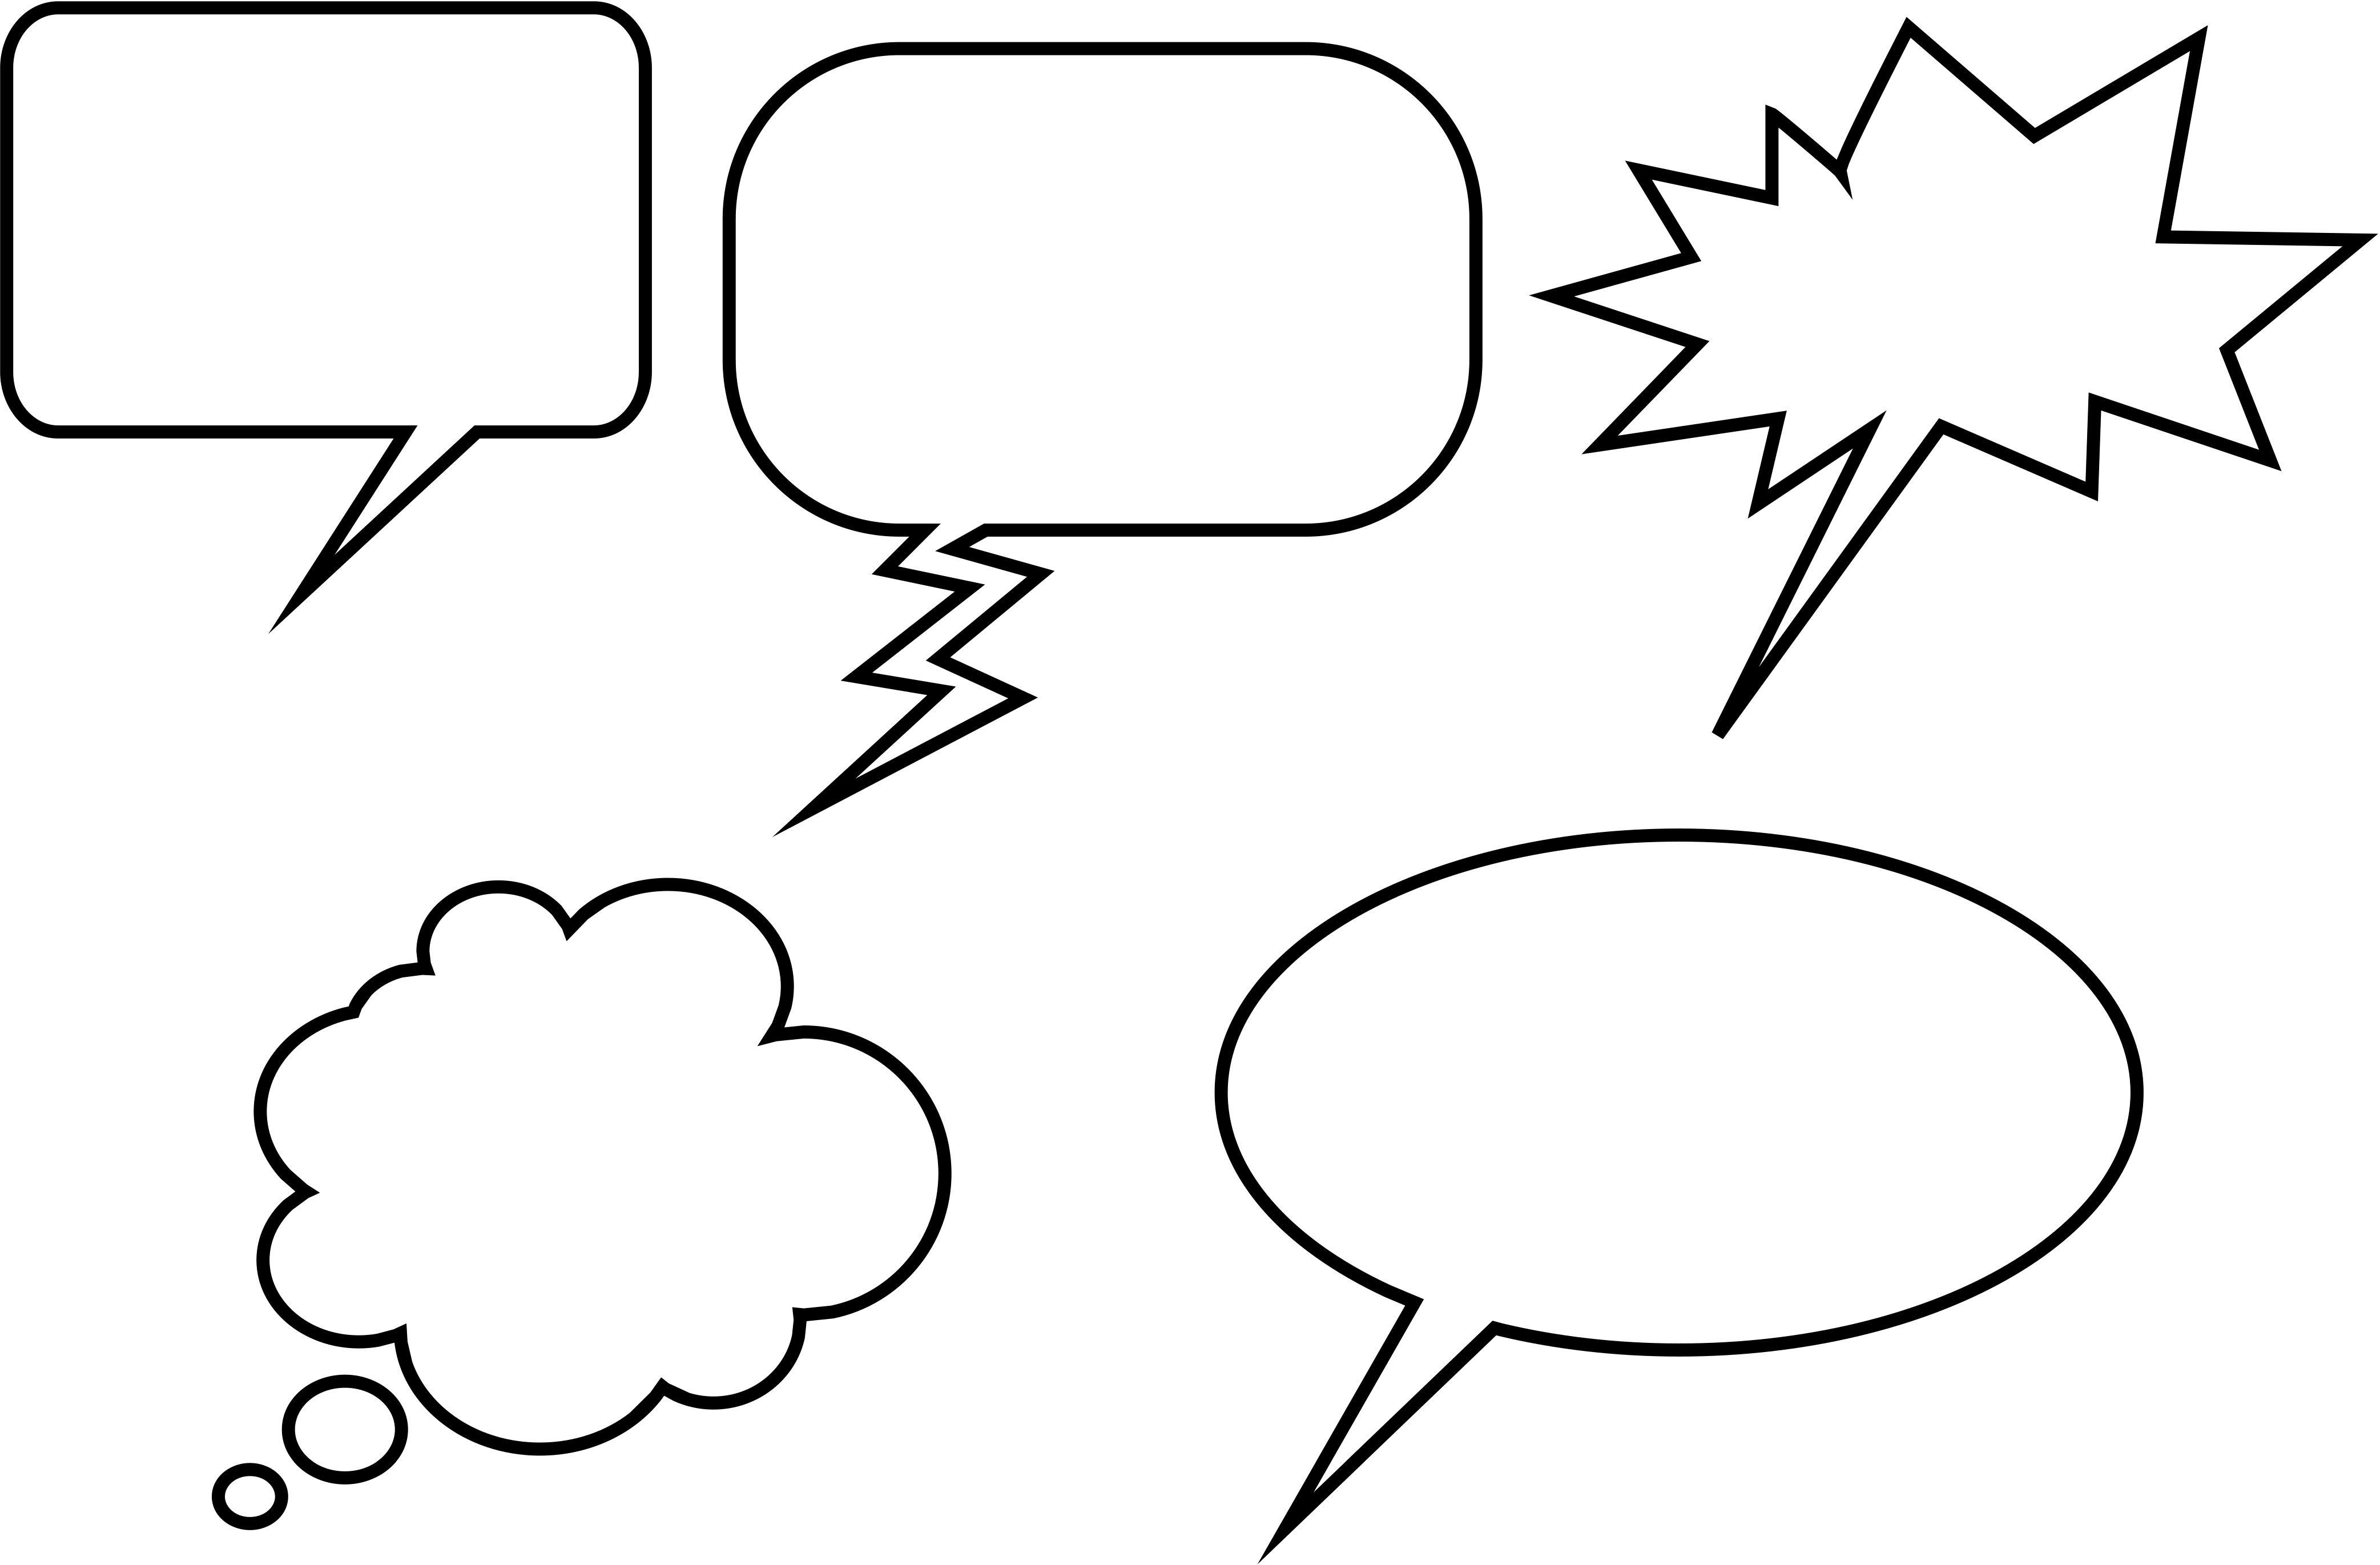 Presentation powerpoint help support manager online